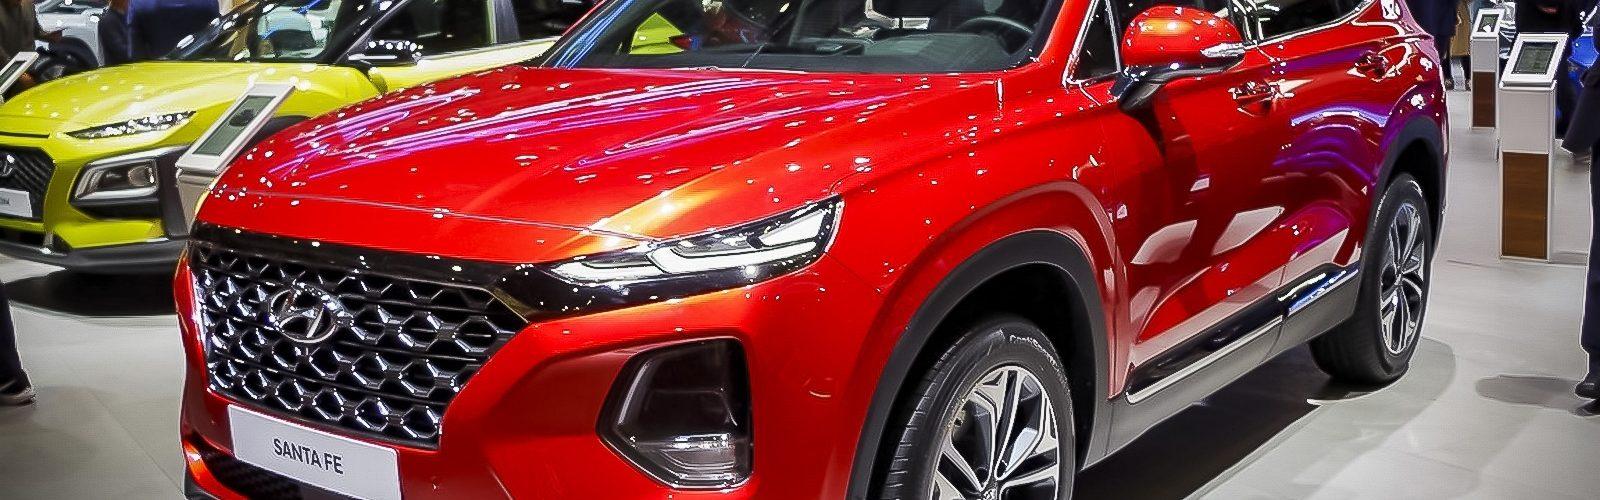 Geneve 2018 Hyundai LeNouvelAutomobiliste 11